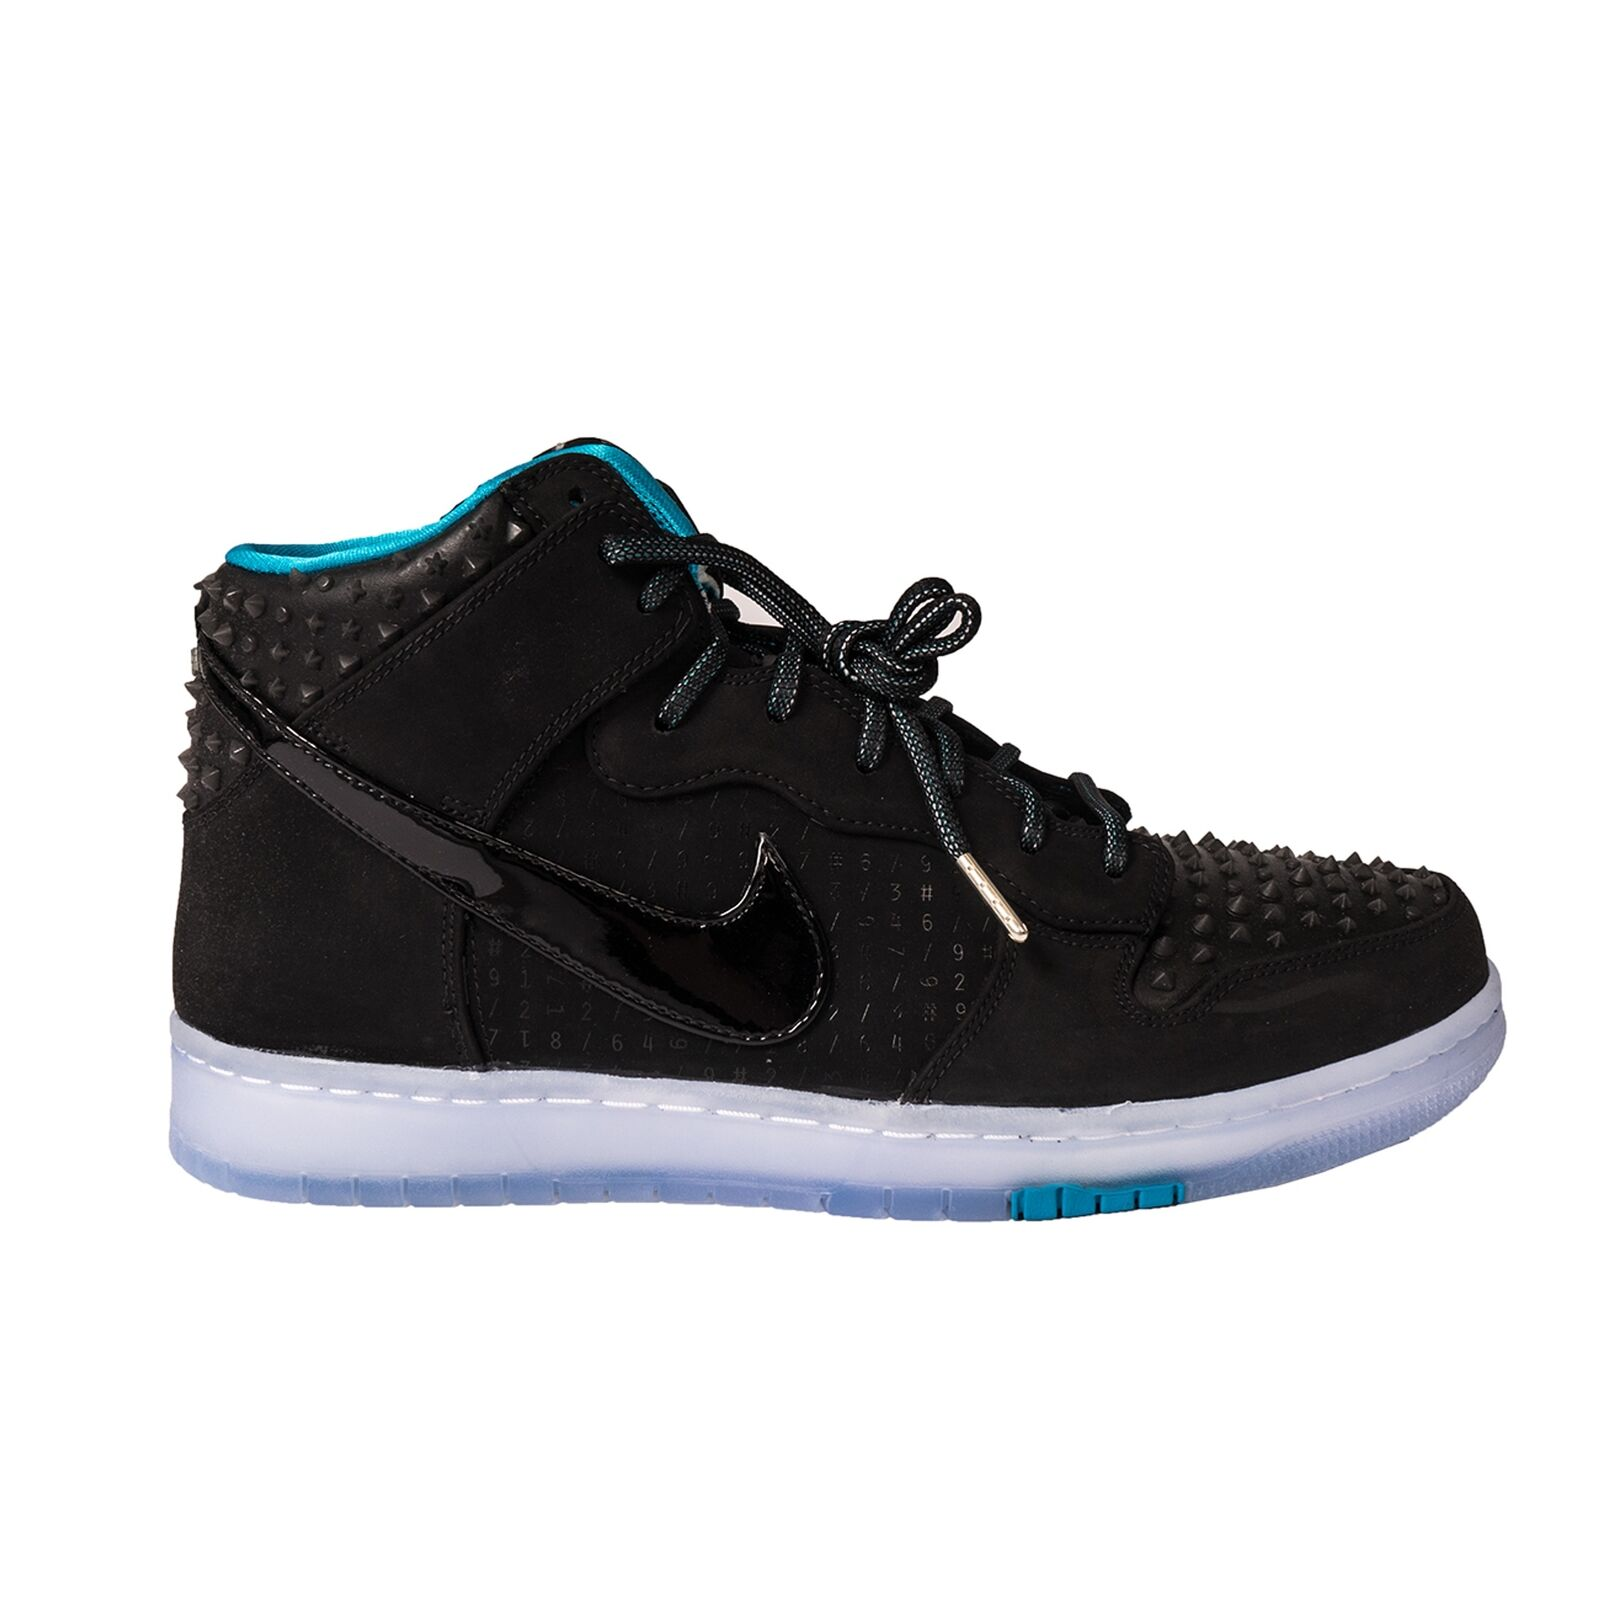 Nike Sportswear Dunk CMFT Prm As QS Hombre Zapatilla Baja Deportivas Negro